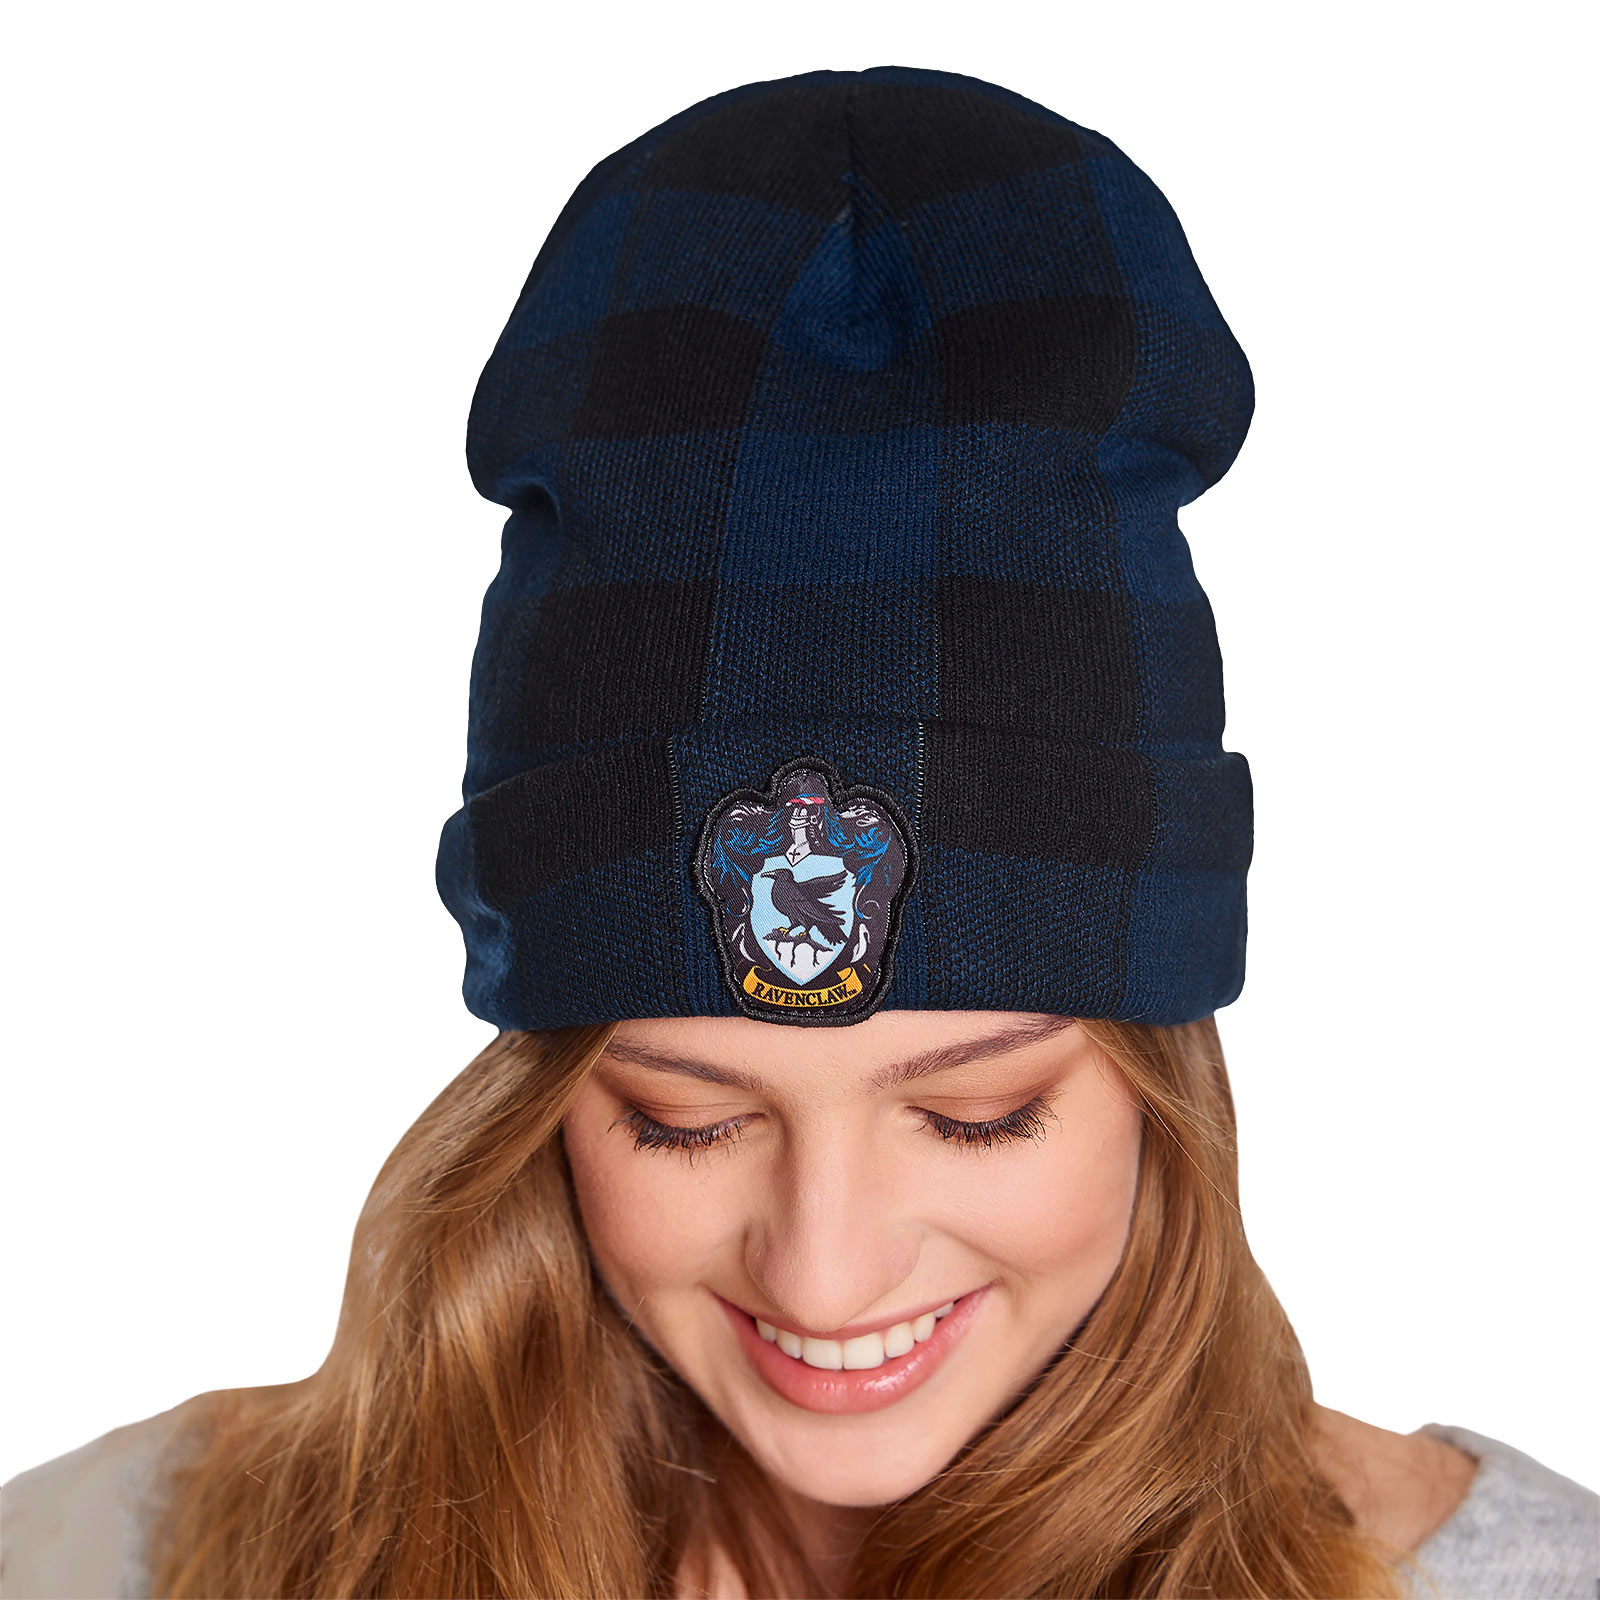 Harry Potter - Ravenclaw Wappen Karo Mütze